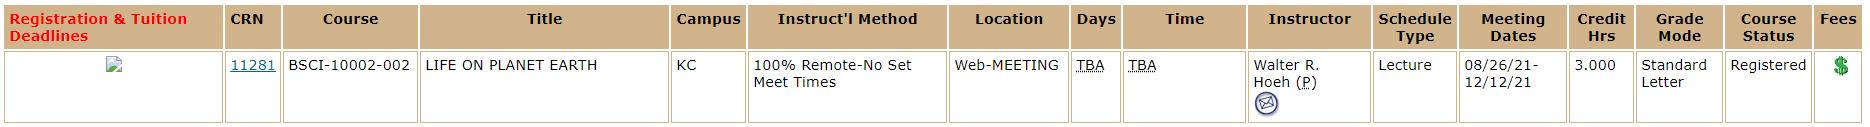 100% Remote-No Set Meet Times sample